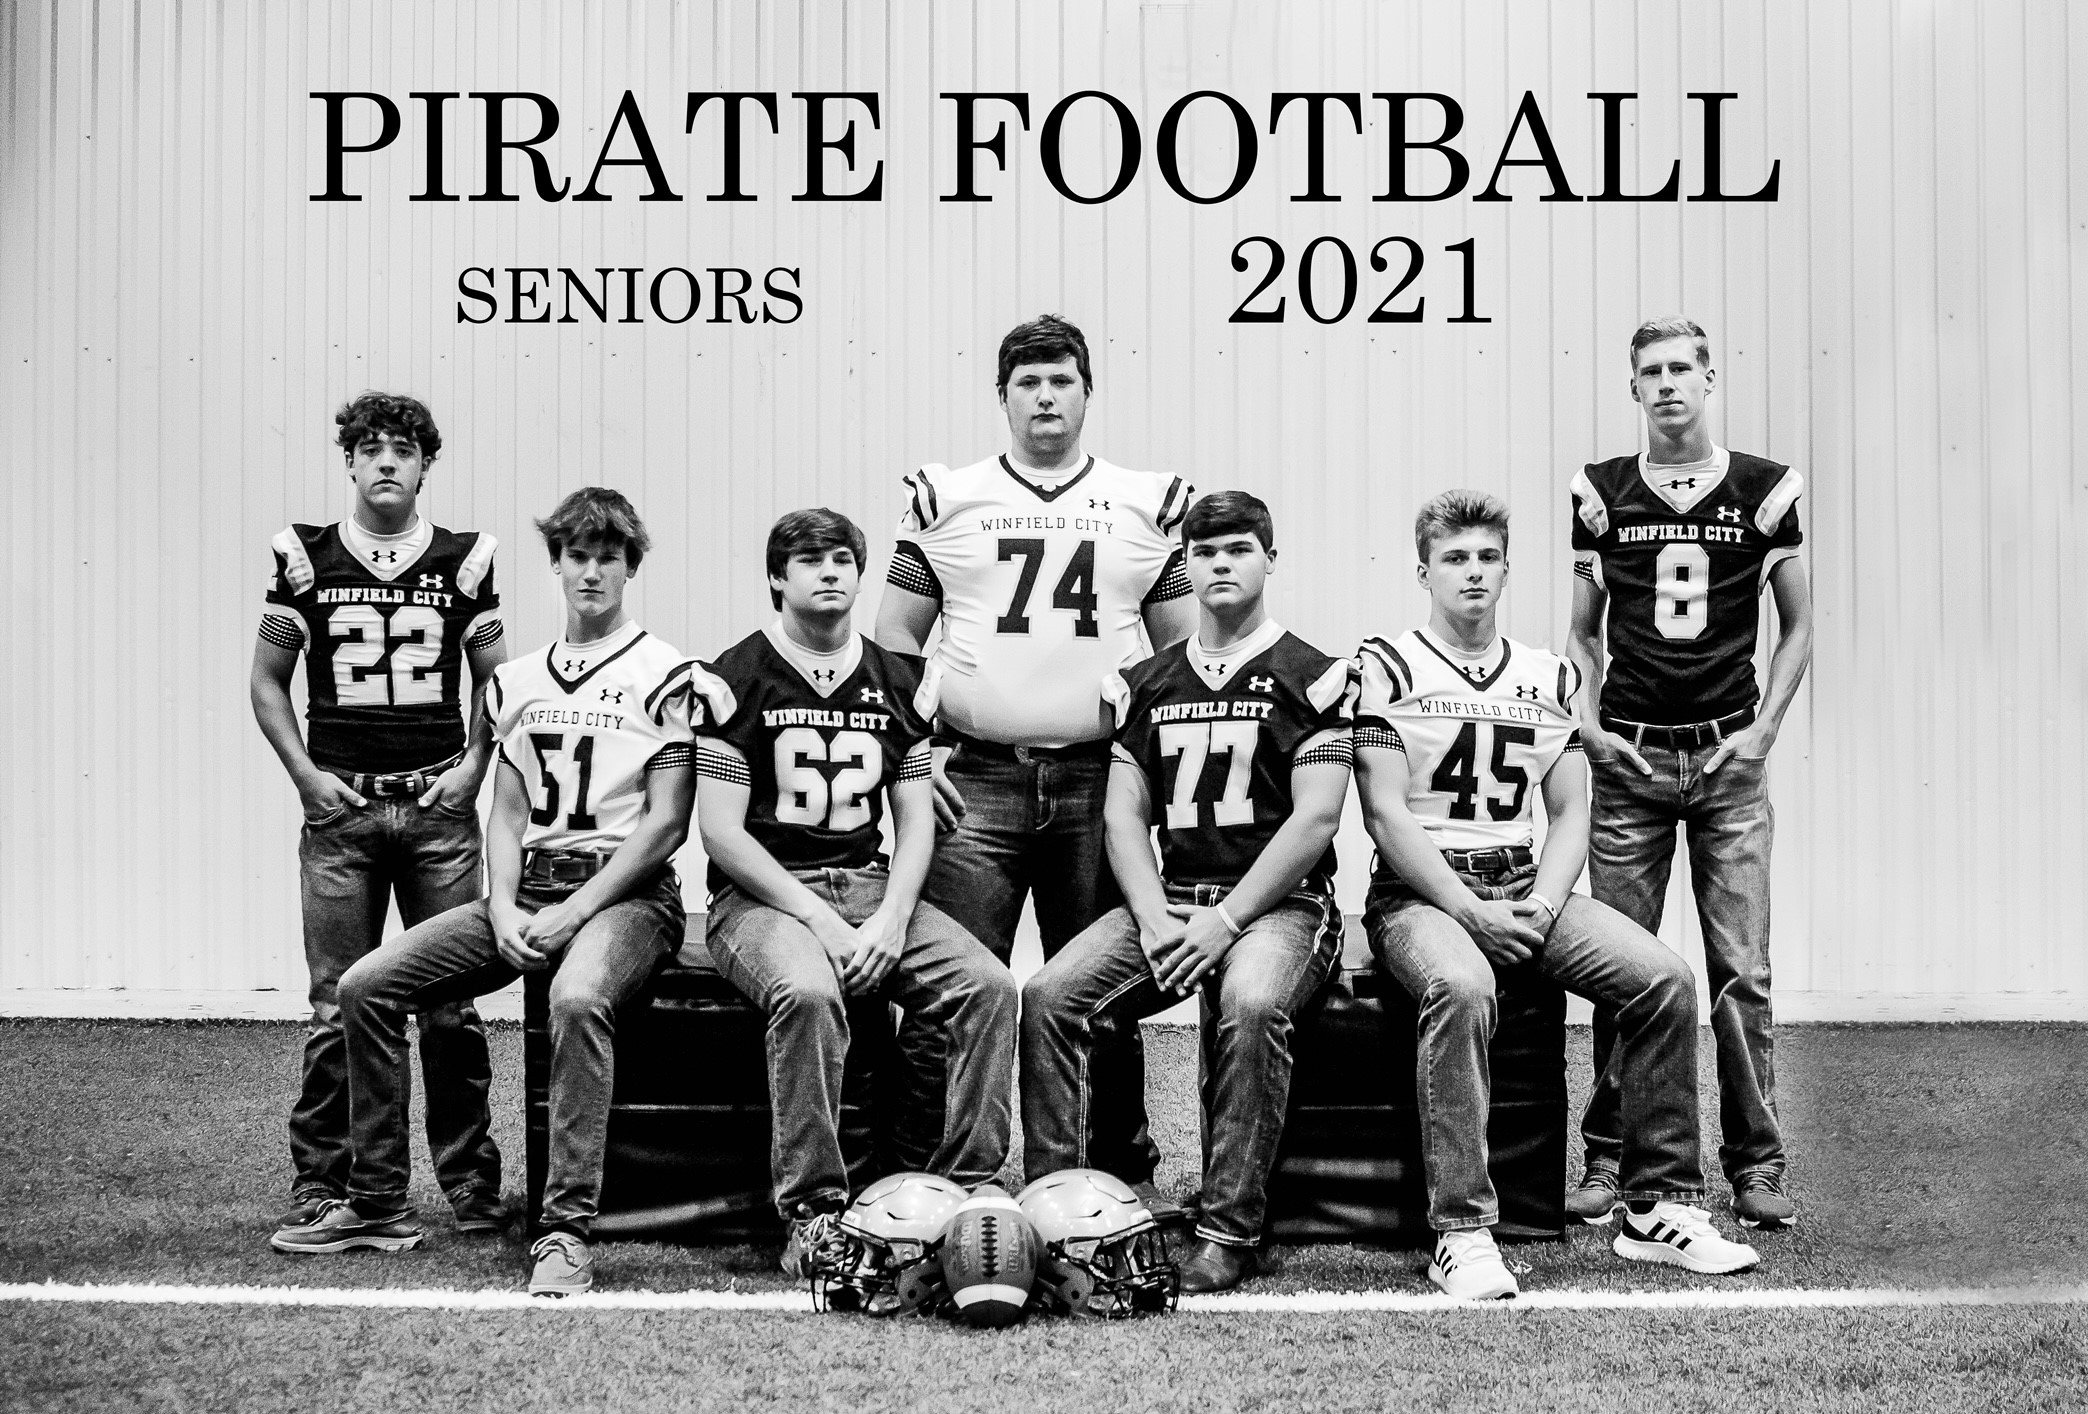 Senior Football Players